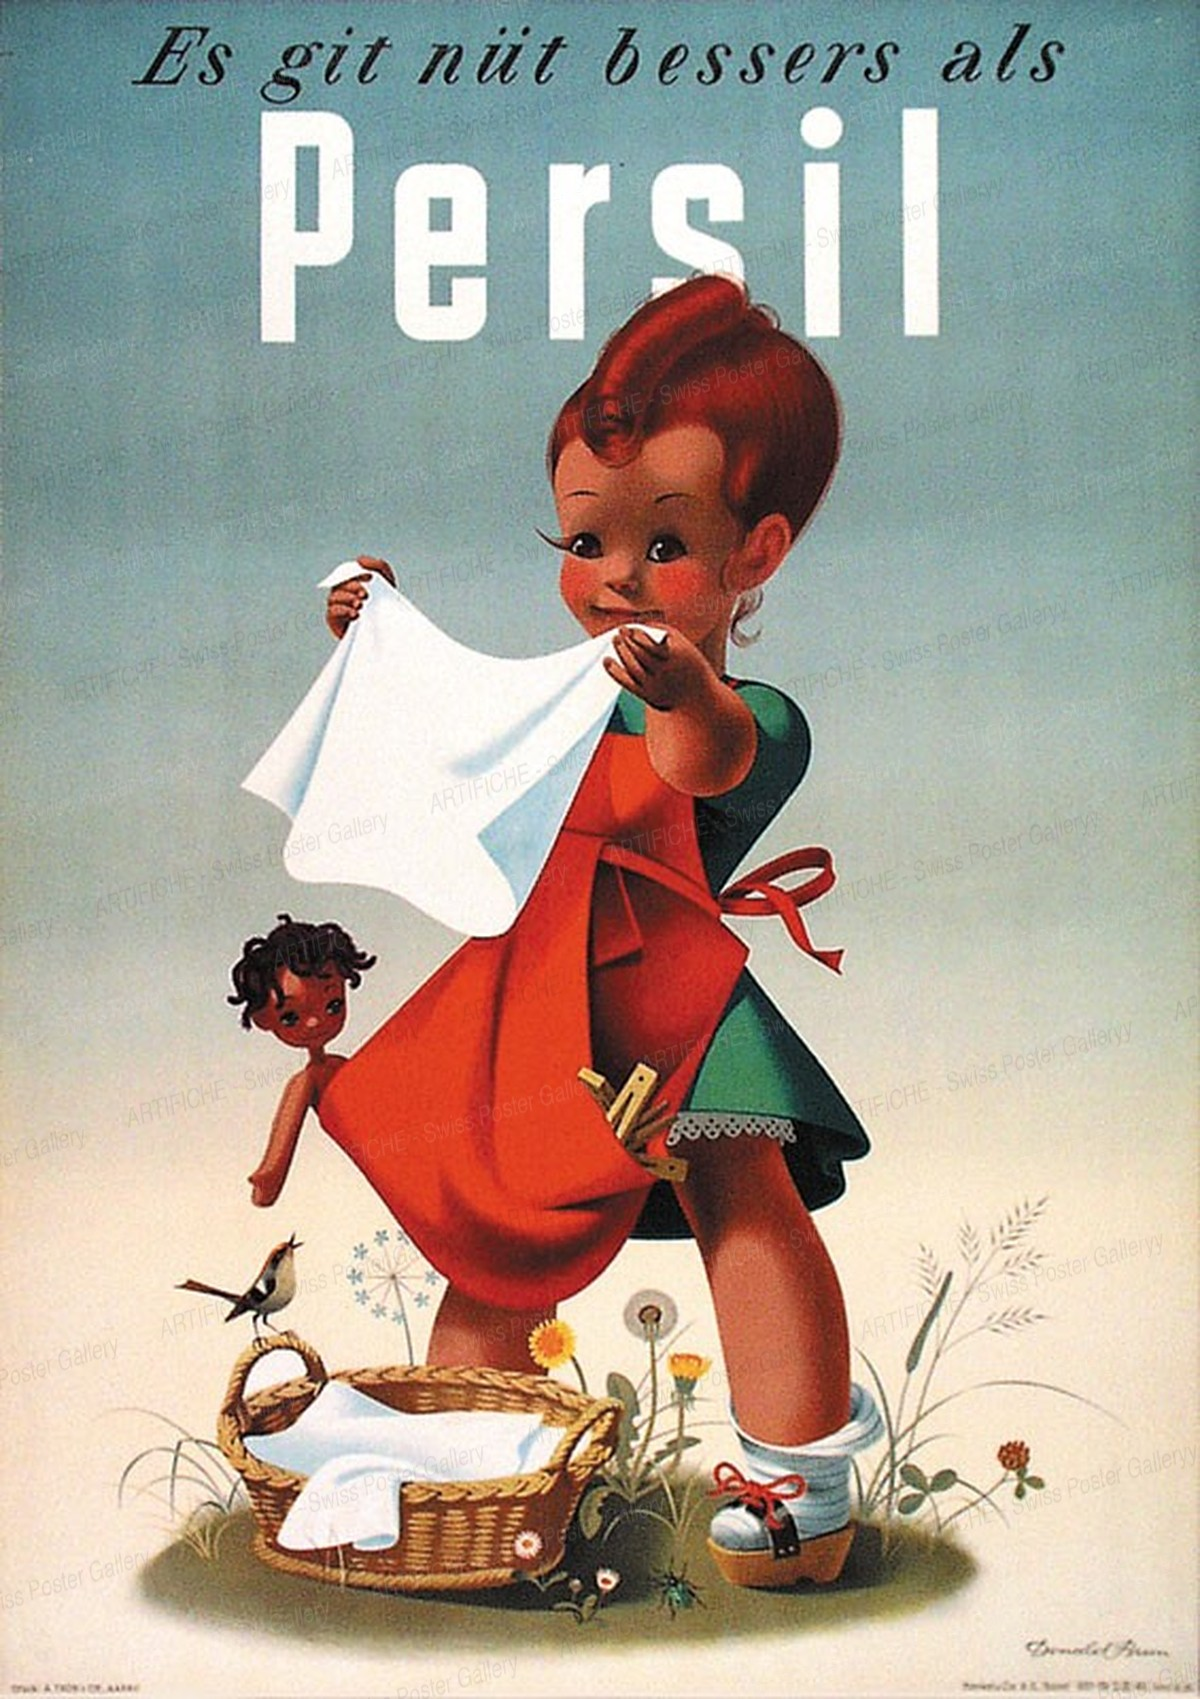 Persil – es git nüt bessers als Persil, Donald Brun